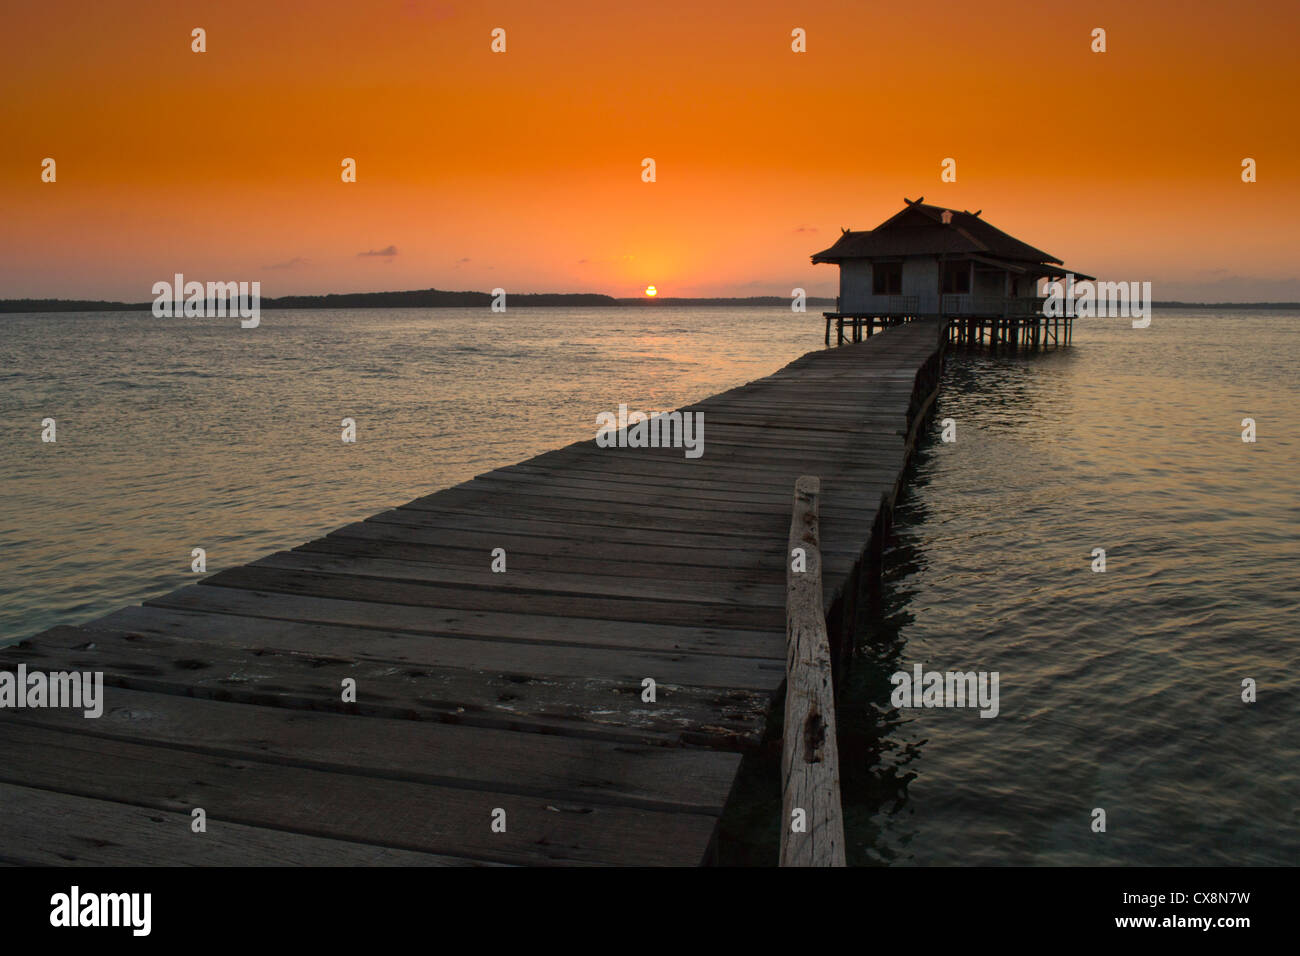 Overwater bungalow at sunset in Kalimunjava Island (Giava, Indonesia) - Stock Image